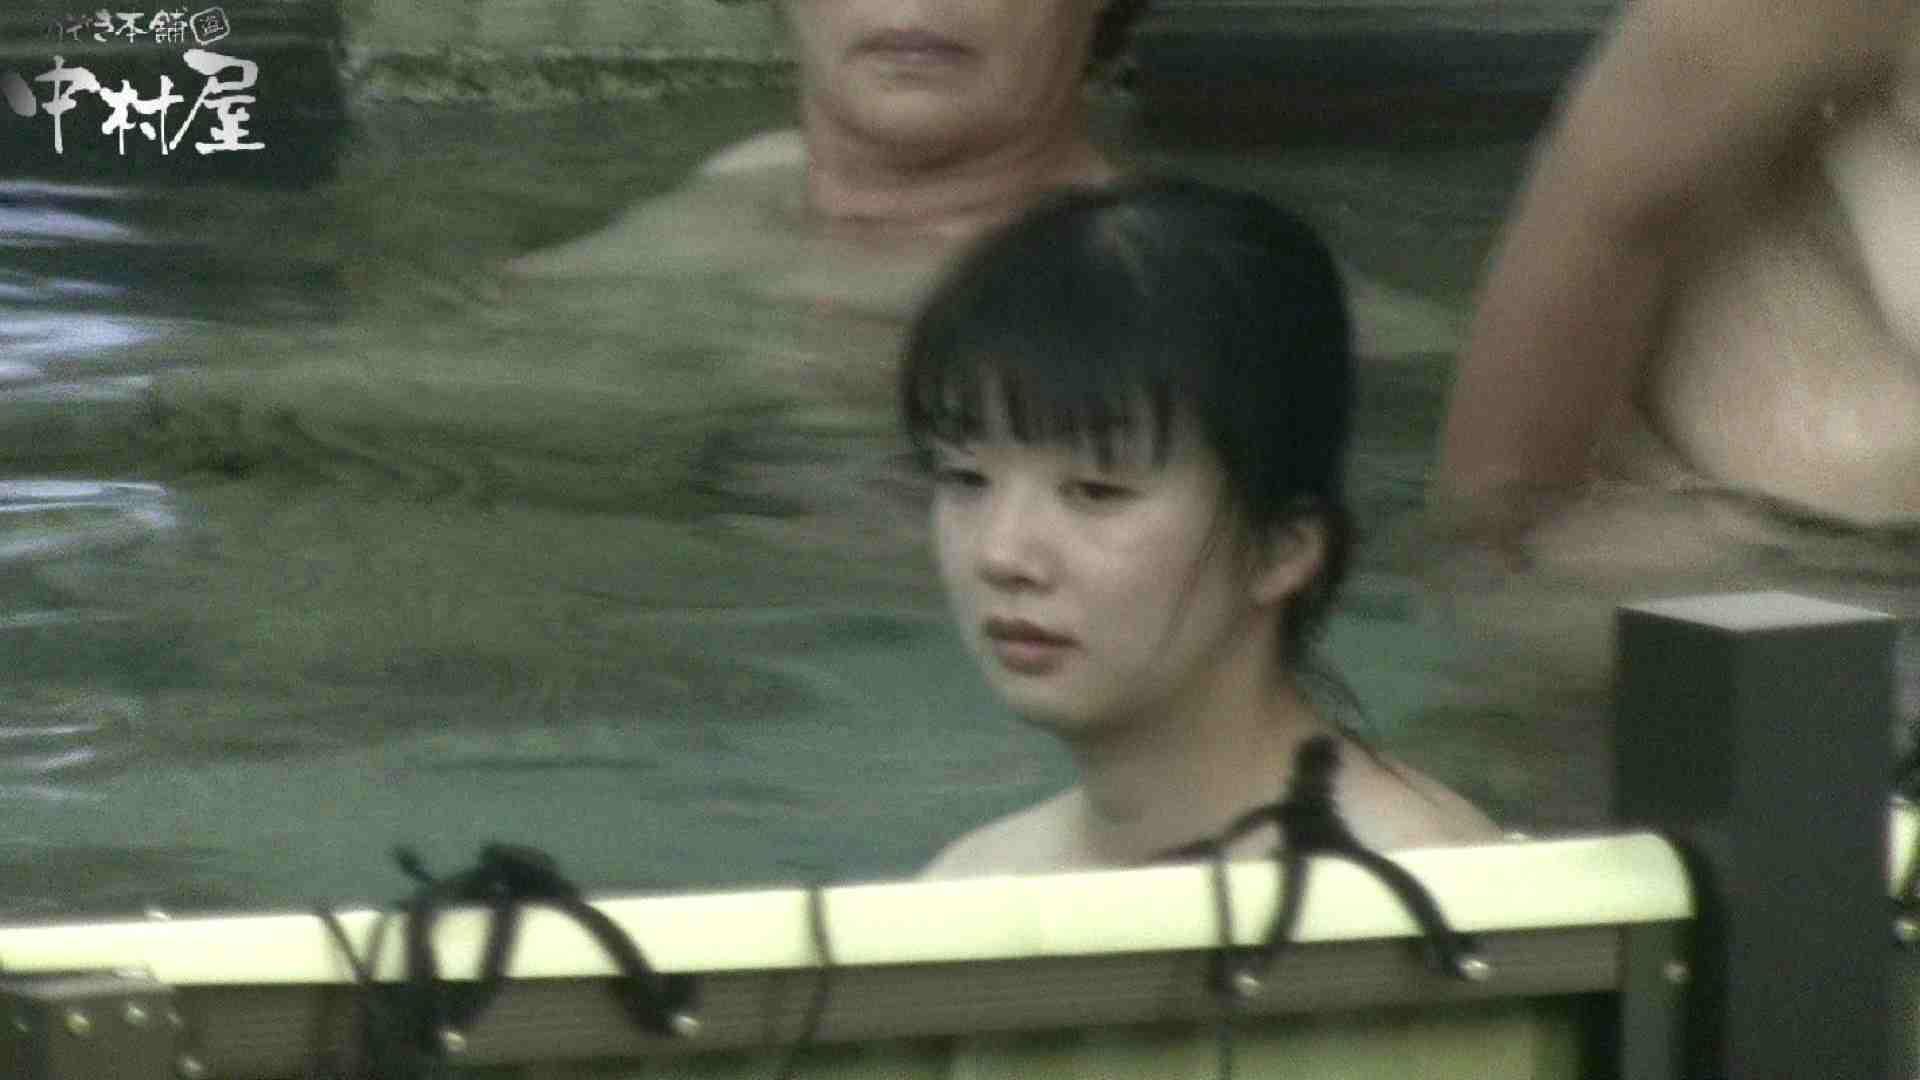 Aquaな露天風呂Vol.904 美しいOLの裸体 オメコ動画キャプチャ 103pic 5